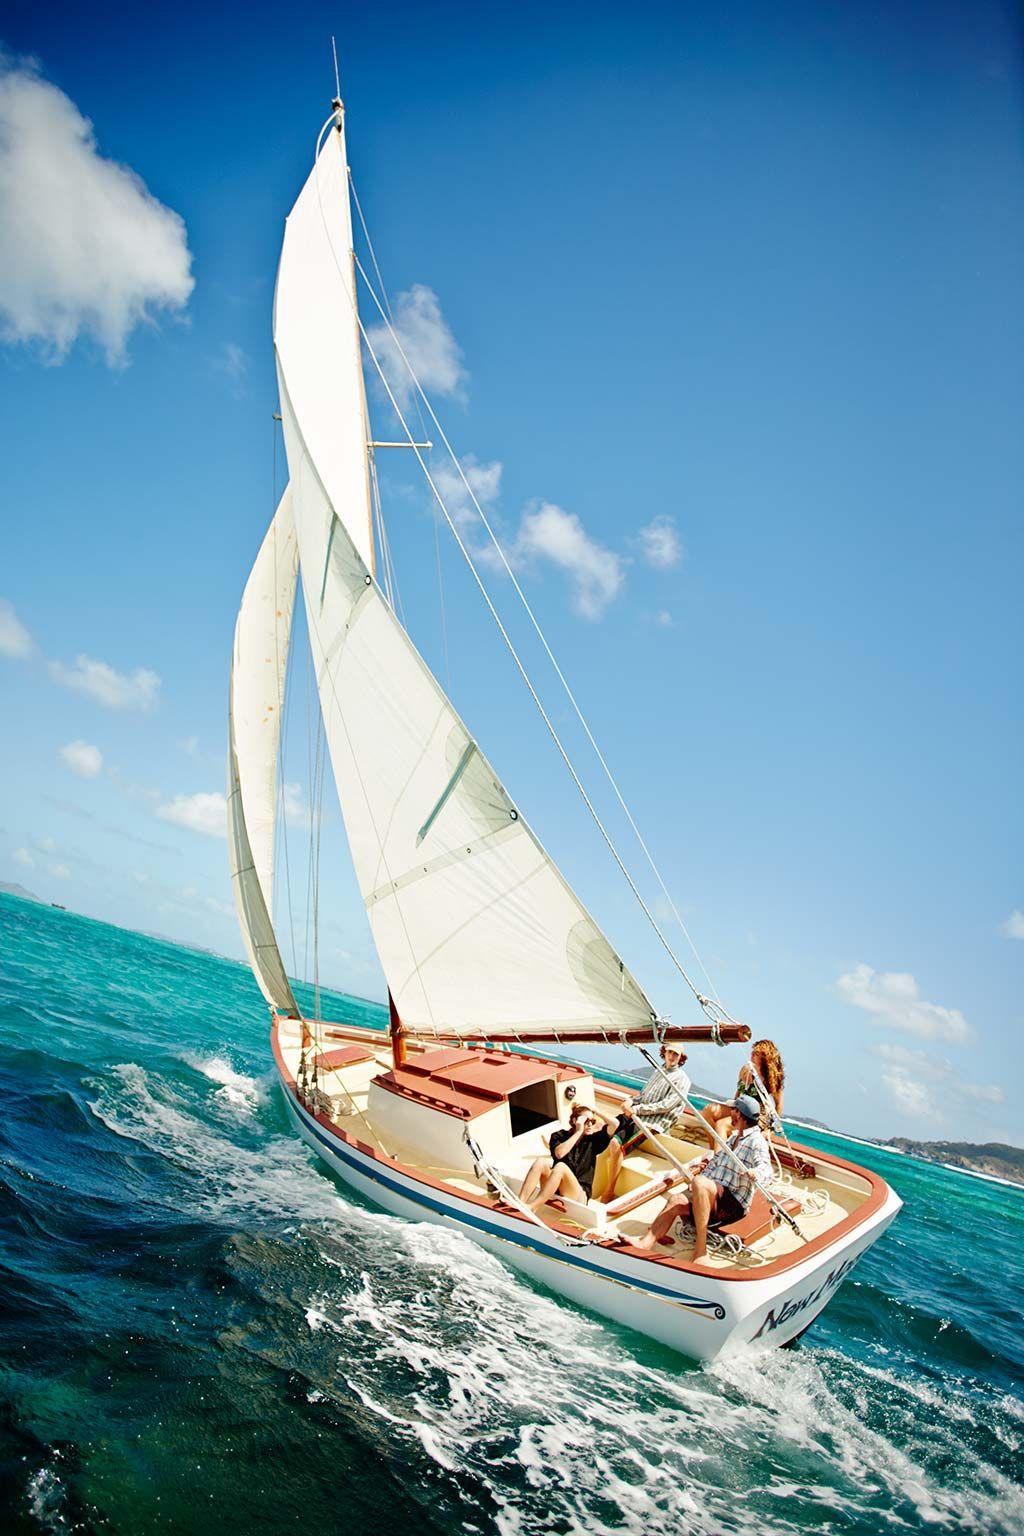 Best 25 Sailing Ideas On Pinterest Sailboat Sailing Boat And Sailboat Listings